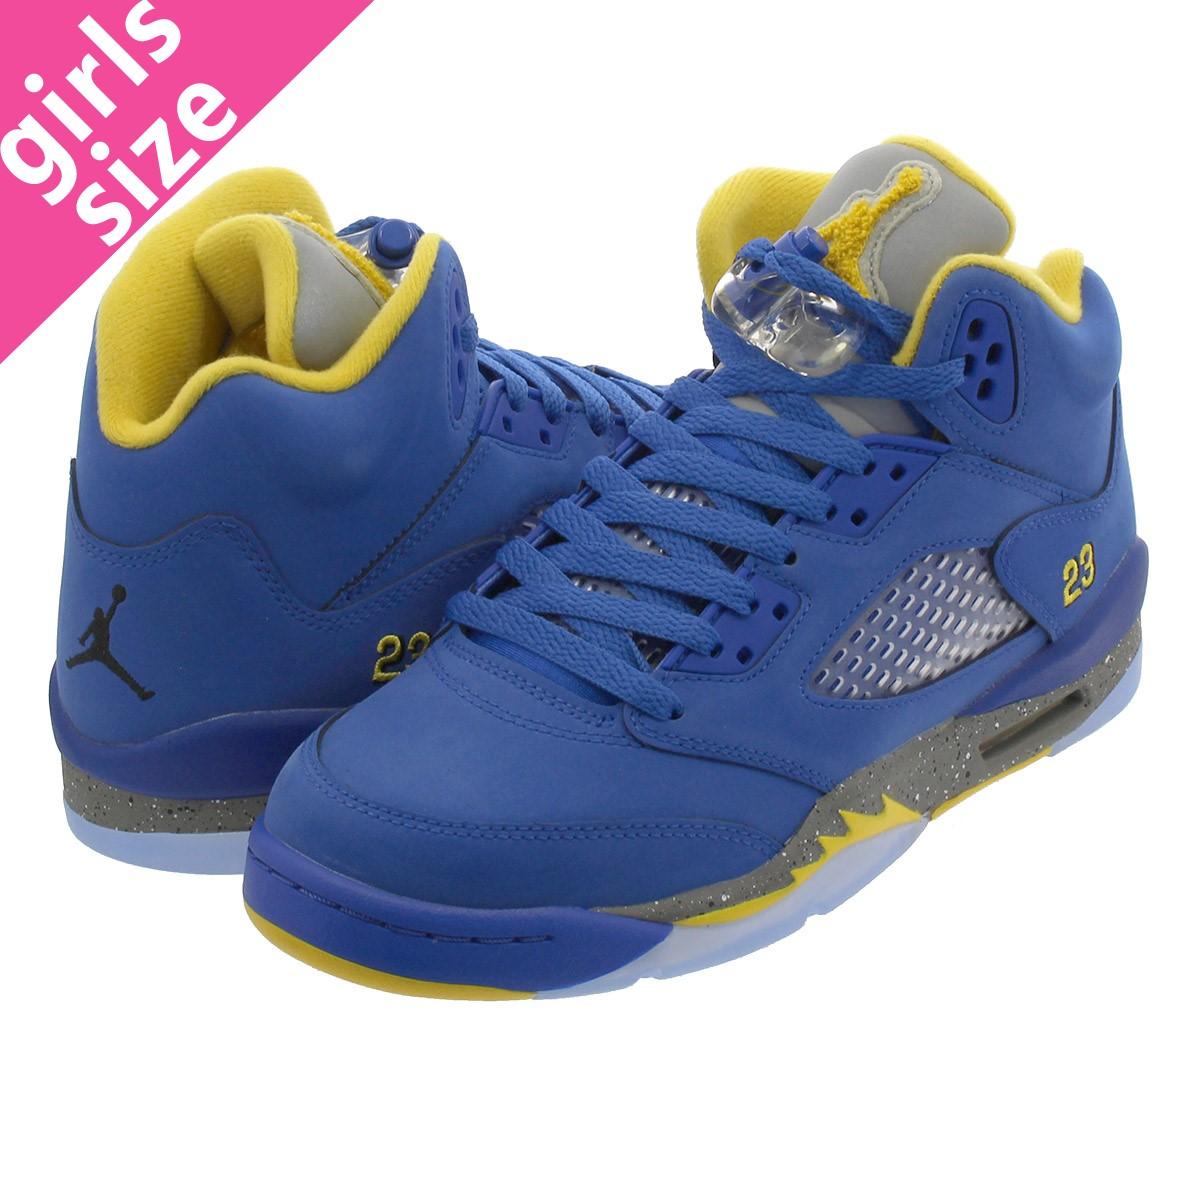 on sale 61f20 8e62a NIKE AIR JORDAN 5 RETRO GS Nike Air Jordan 5 nostalgic GS VARSITY ROYAL VARSITY  MAIZE ci3287-400